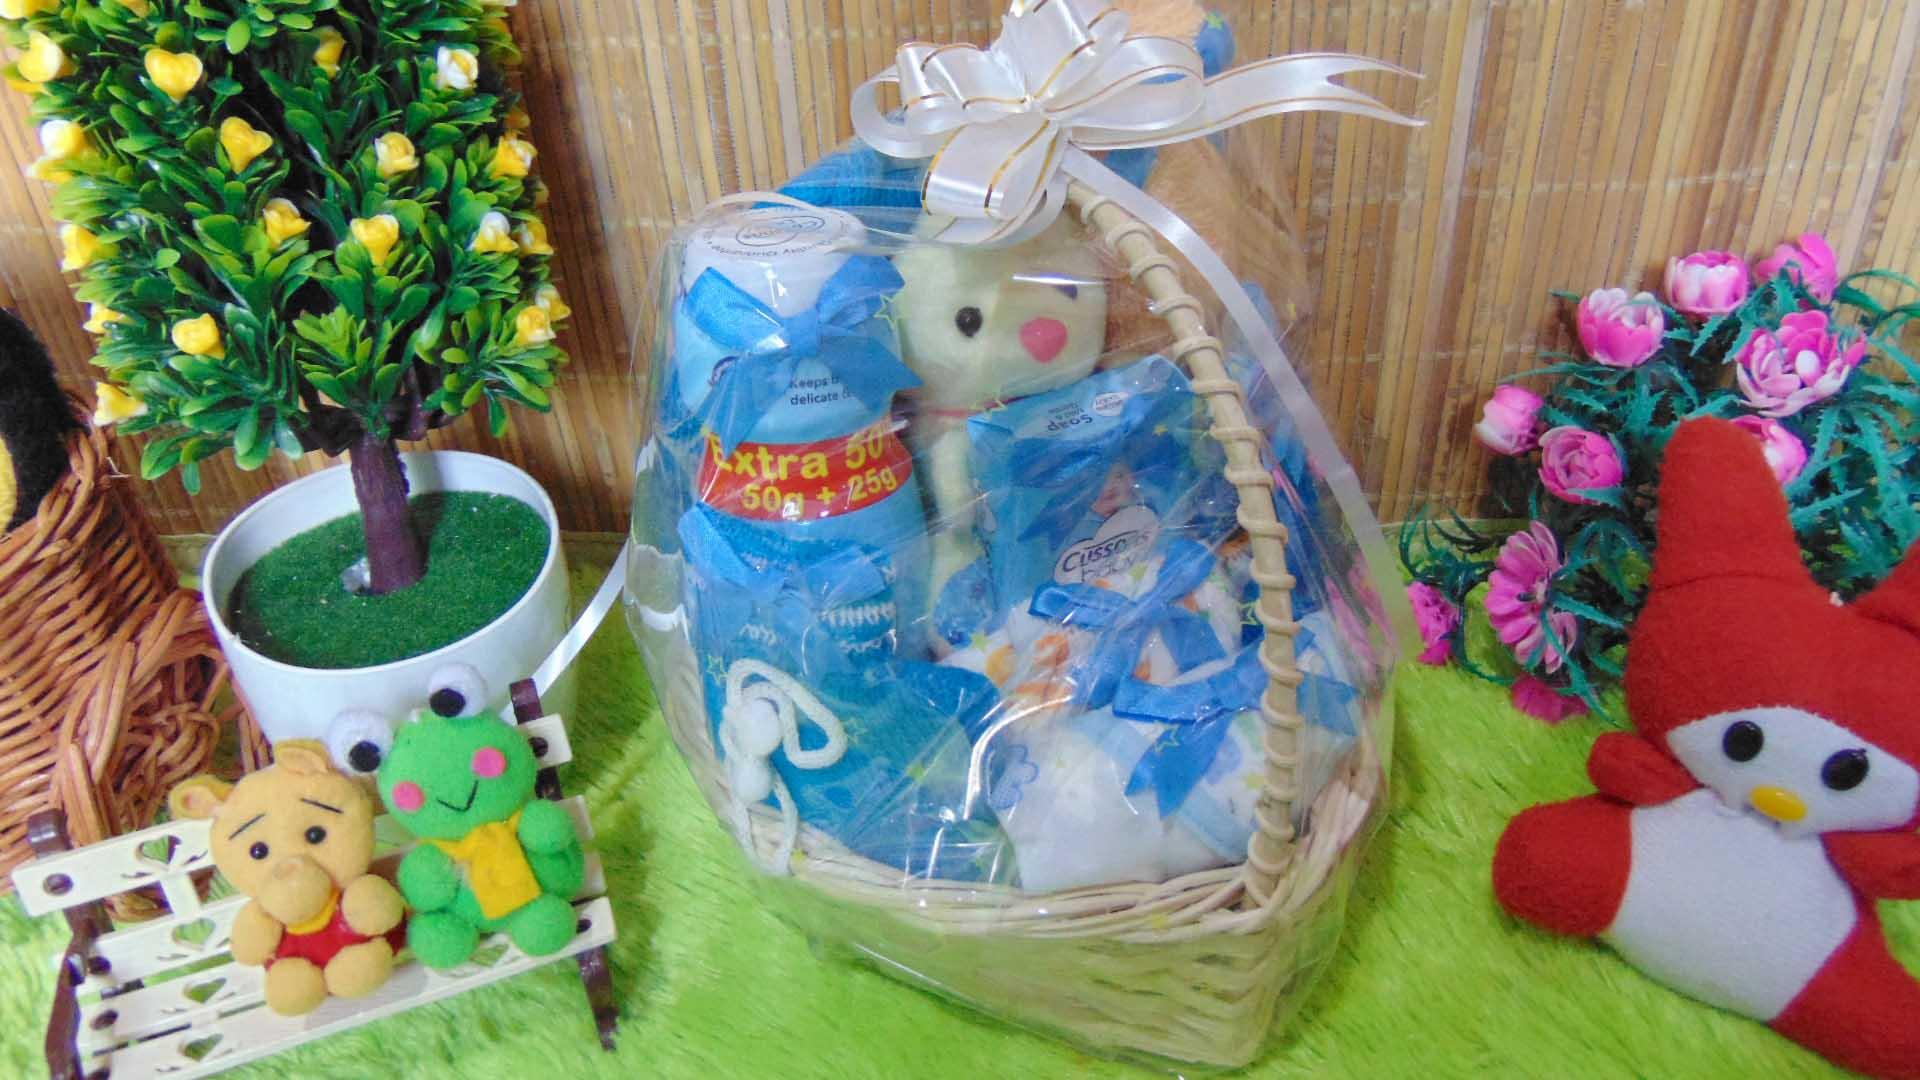 kembarshop- TERLARIS paket kado bayi baby gift kado melahirkan keranjang LITTLE LOVE komplit- parcel